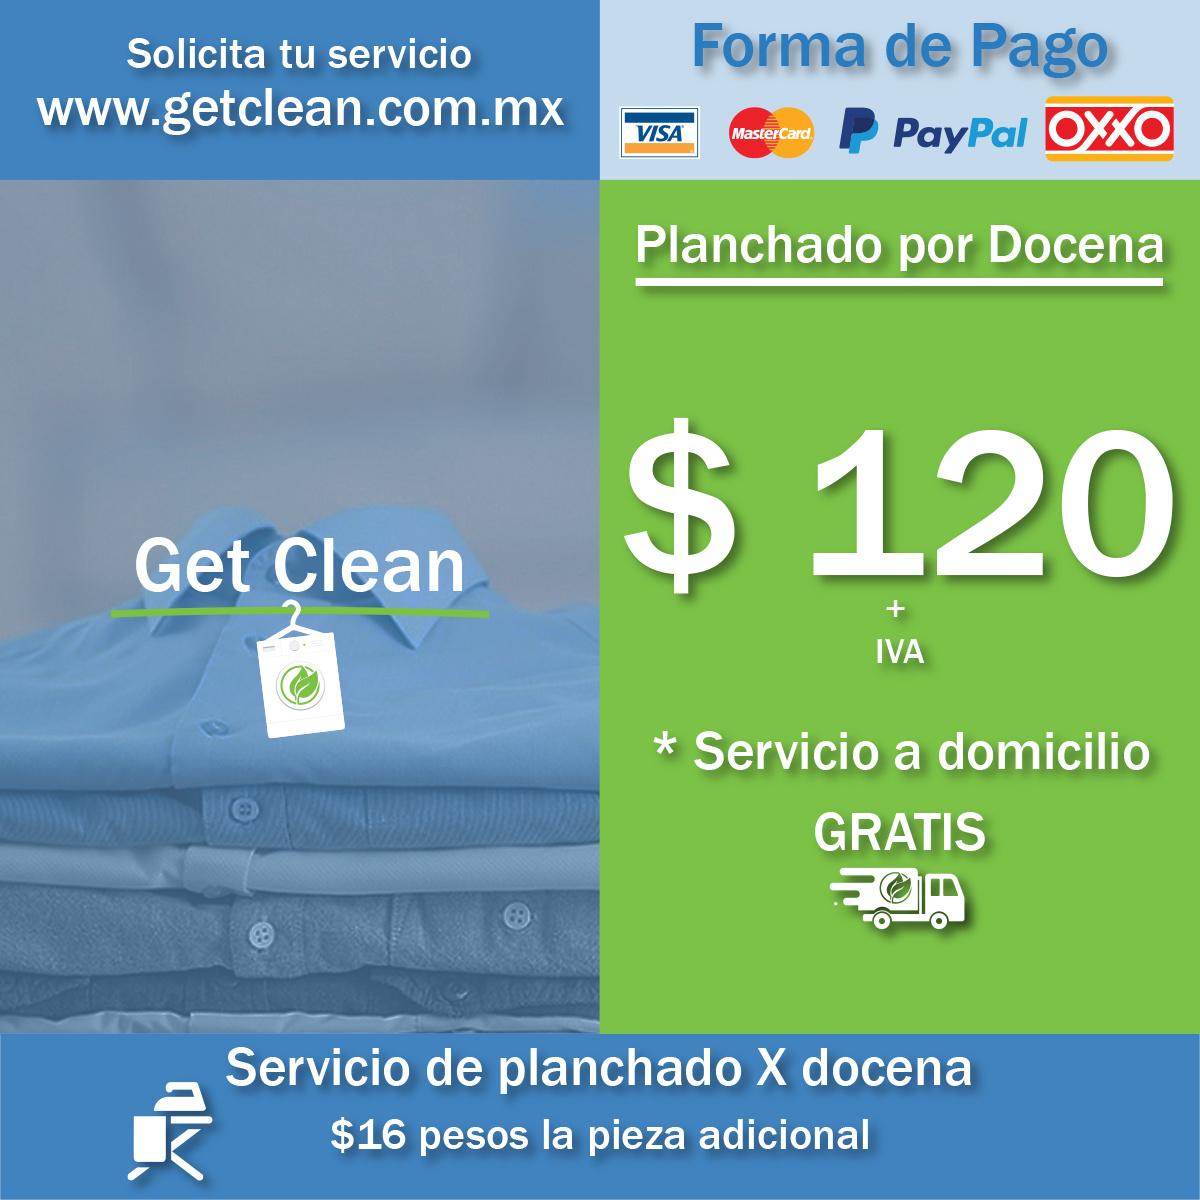 https://0201.nccdn.net/4_2/000/000/046/6ea/Docena-de-Planchado-1200x1200.jpg